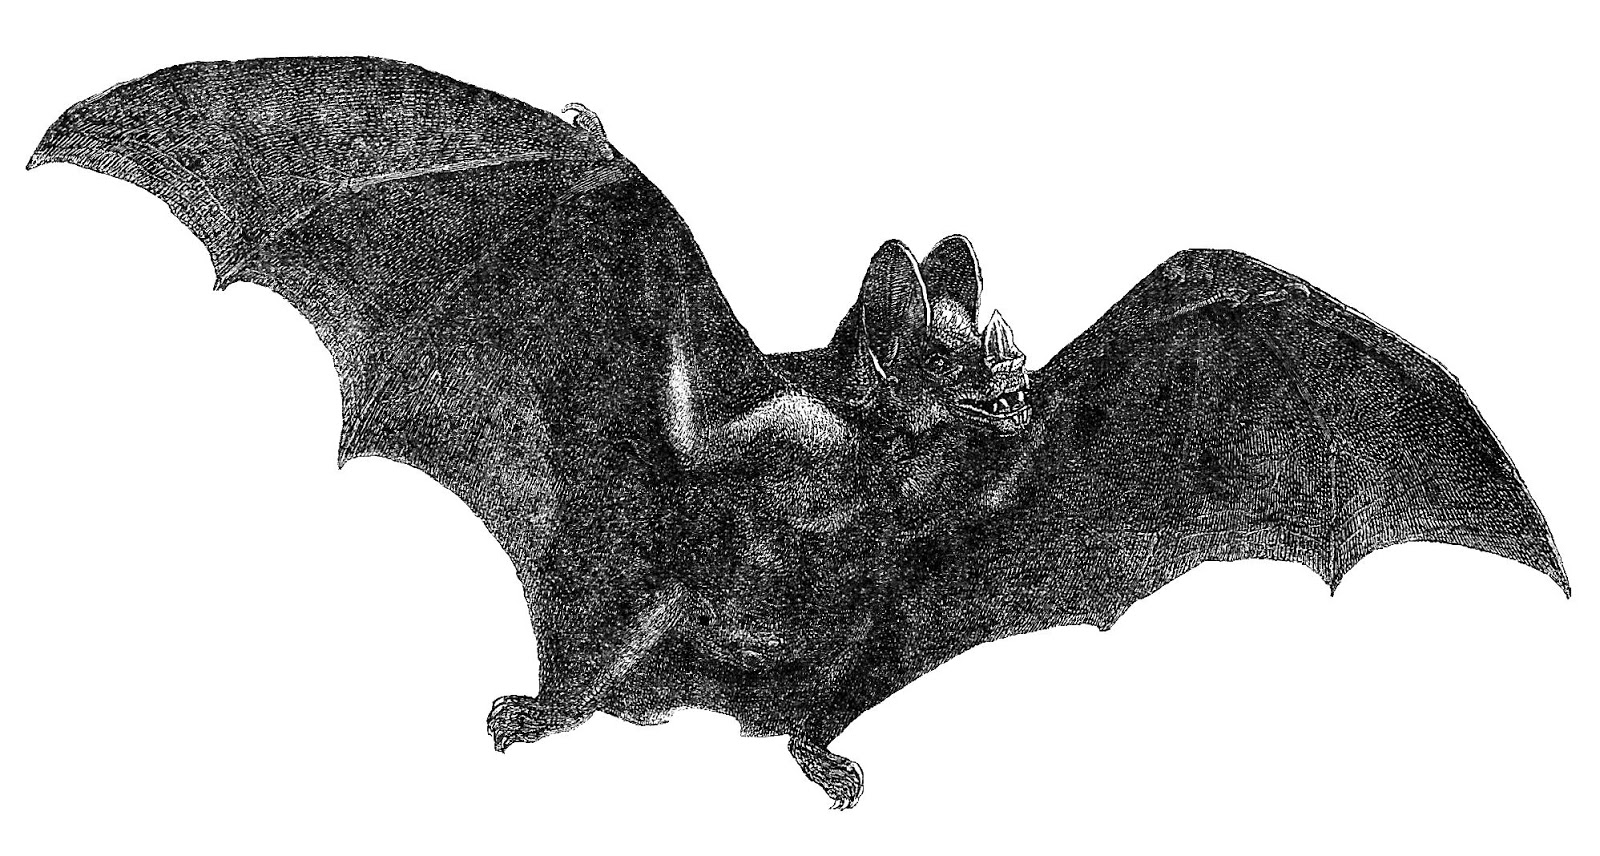 Antique bat free clipart clip royalty free stock Free Vintage Bat Cliparts, Download Free Clip Art, Free Clip Art on ... clip royalty free stock